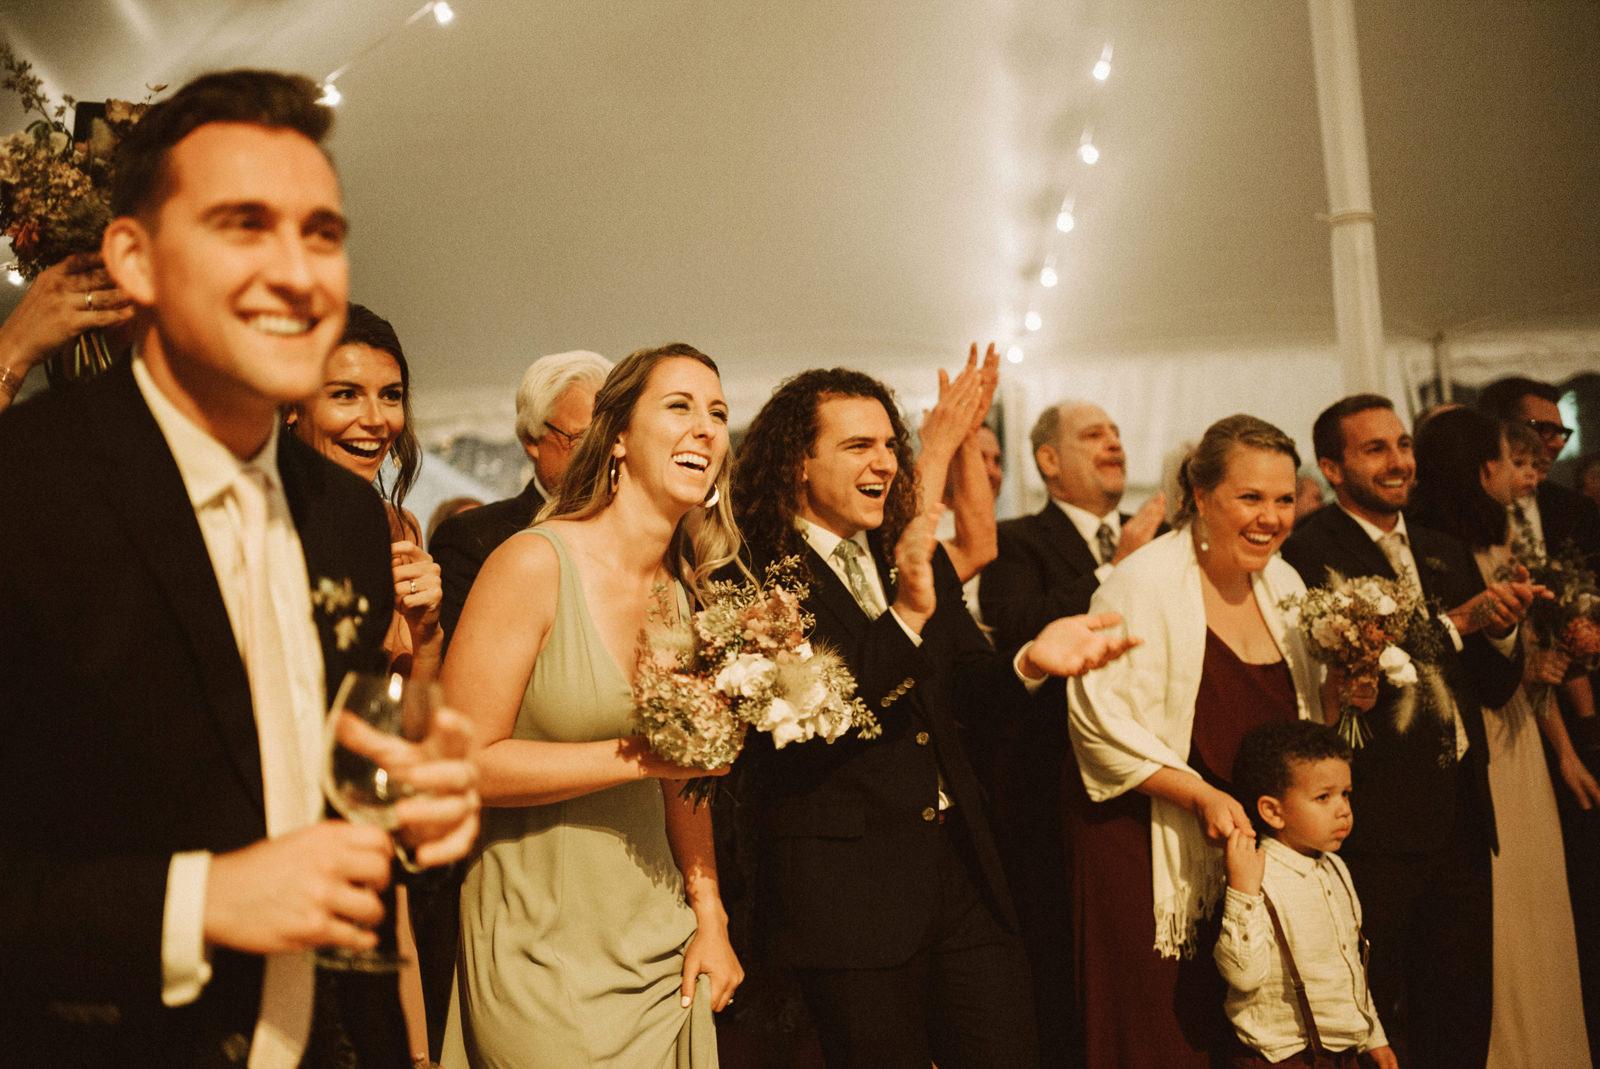 bridgeport-wedding-144 BRIDGEPORT, CONNECTICUT BACKYARD WEDDING